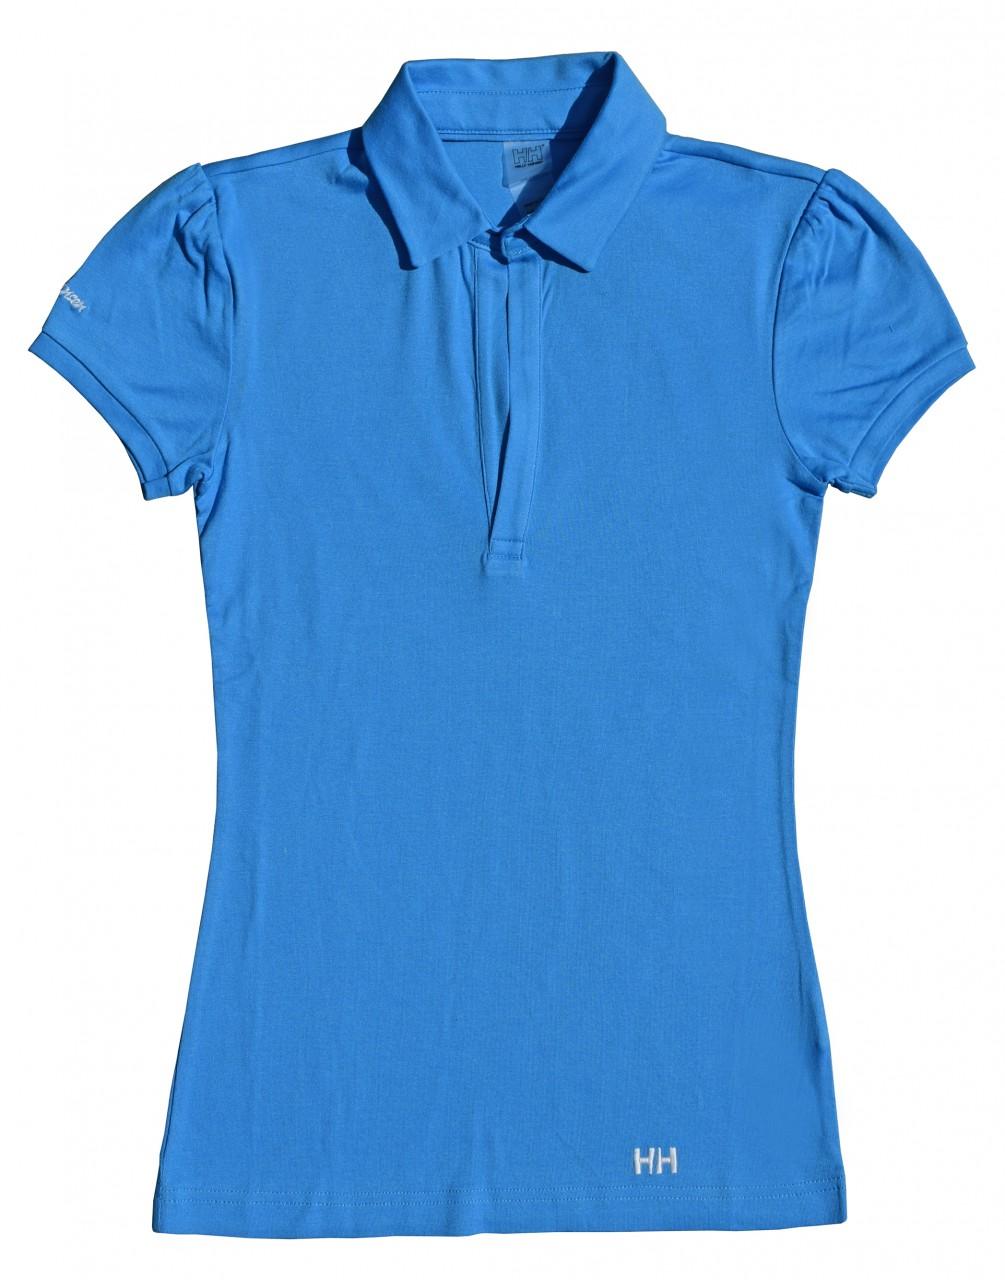 helly hansen polo shirt damen xs t shirt azur blau schmal geschnitten kurzarm ebay. Black Bedroom Furniture Sets. Home Design Ideas